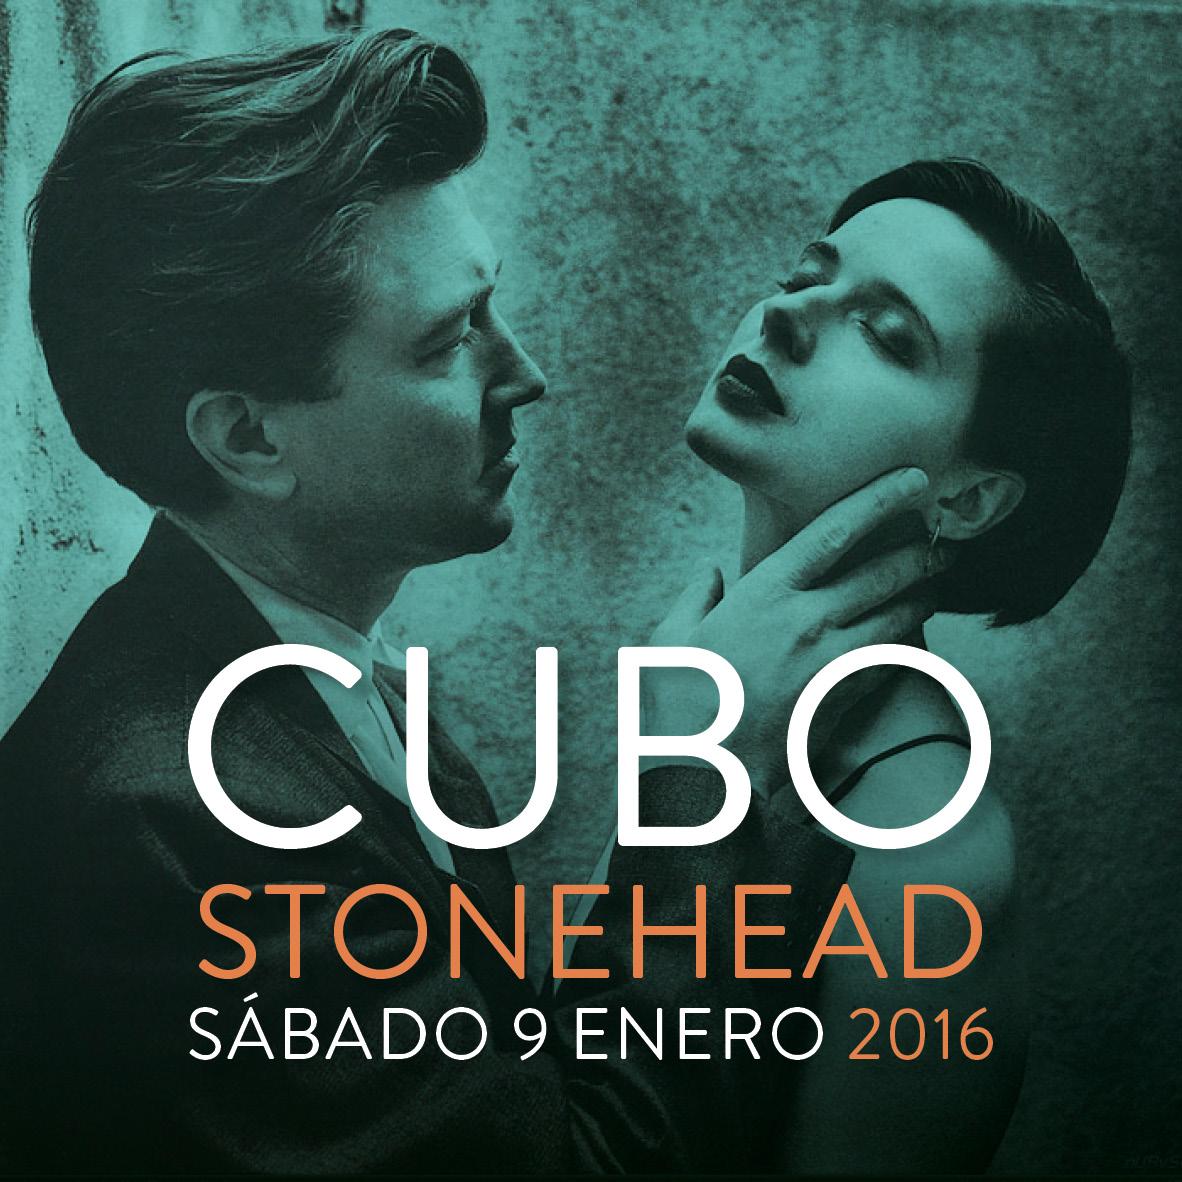 cubo_9enero_stonehead